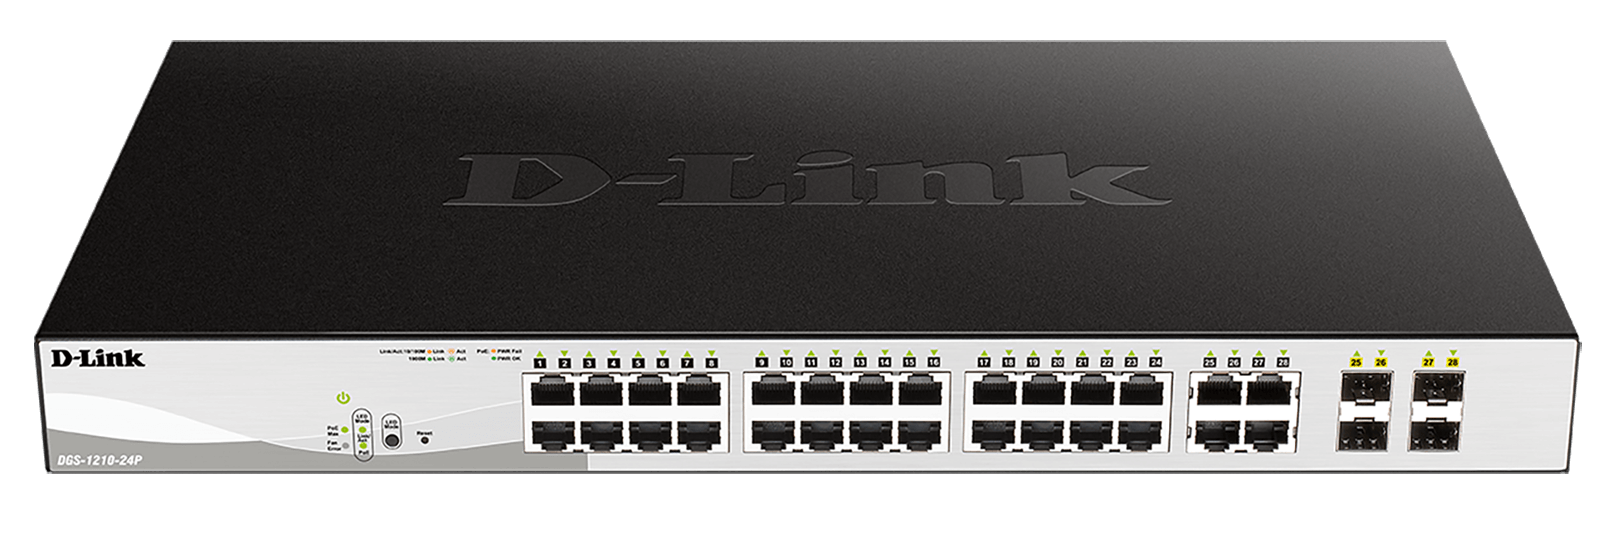 D-Link DGS-1210-48 Switch Driver